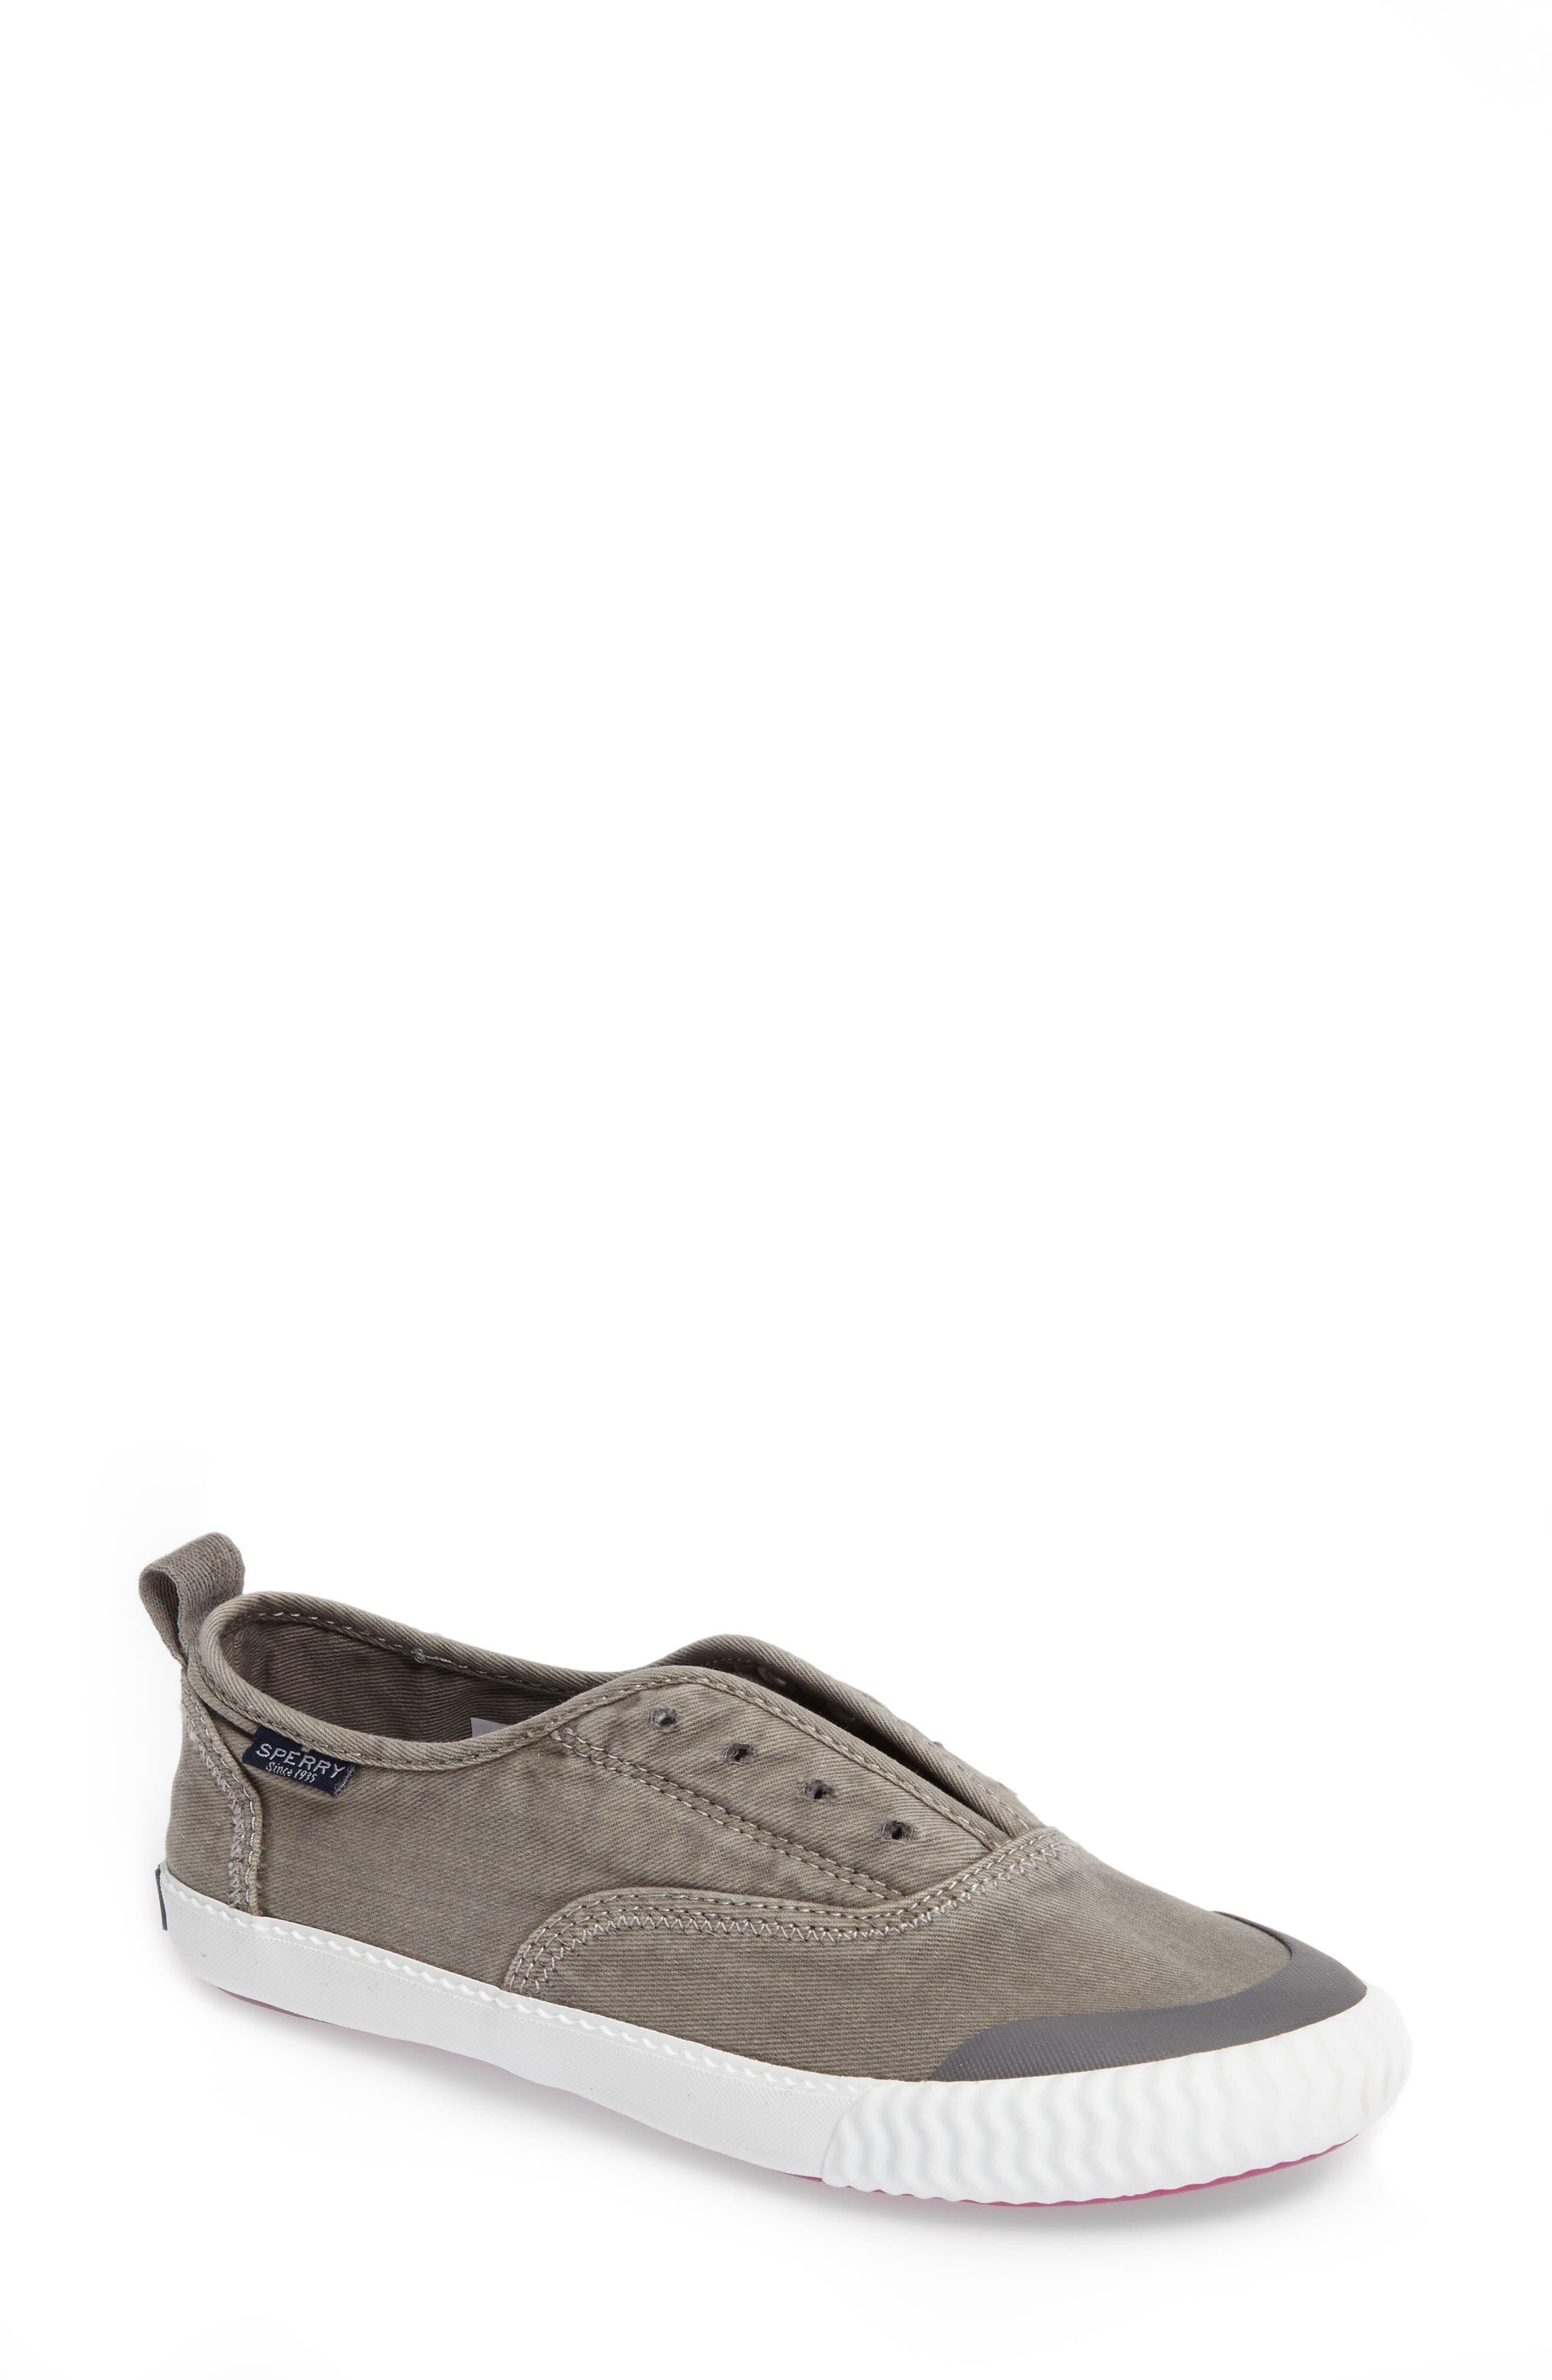 Main Image - Sperry Sayel Slip-On Sneaker (Women)